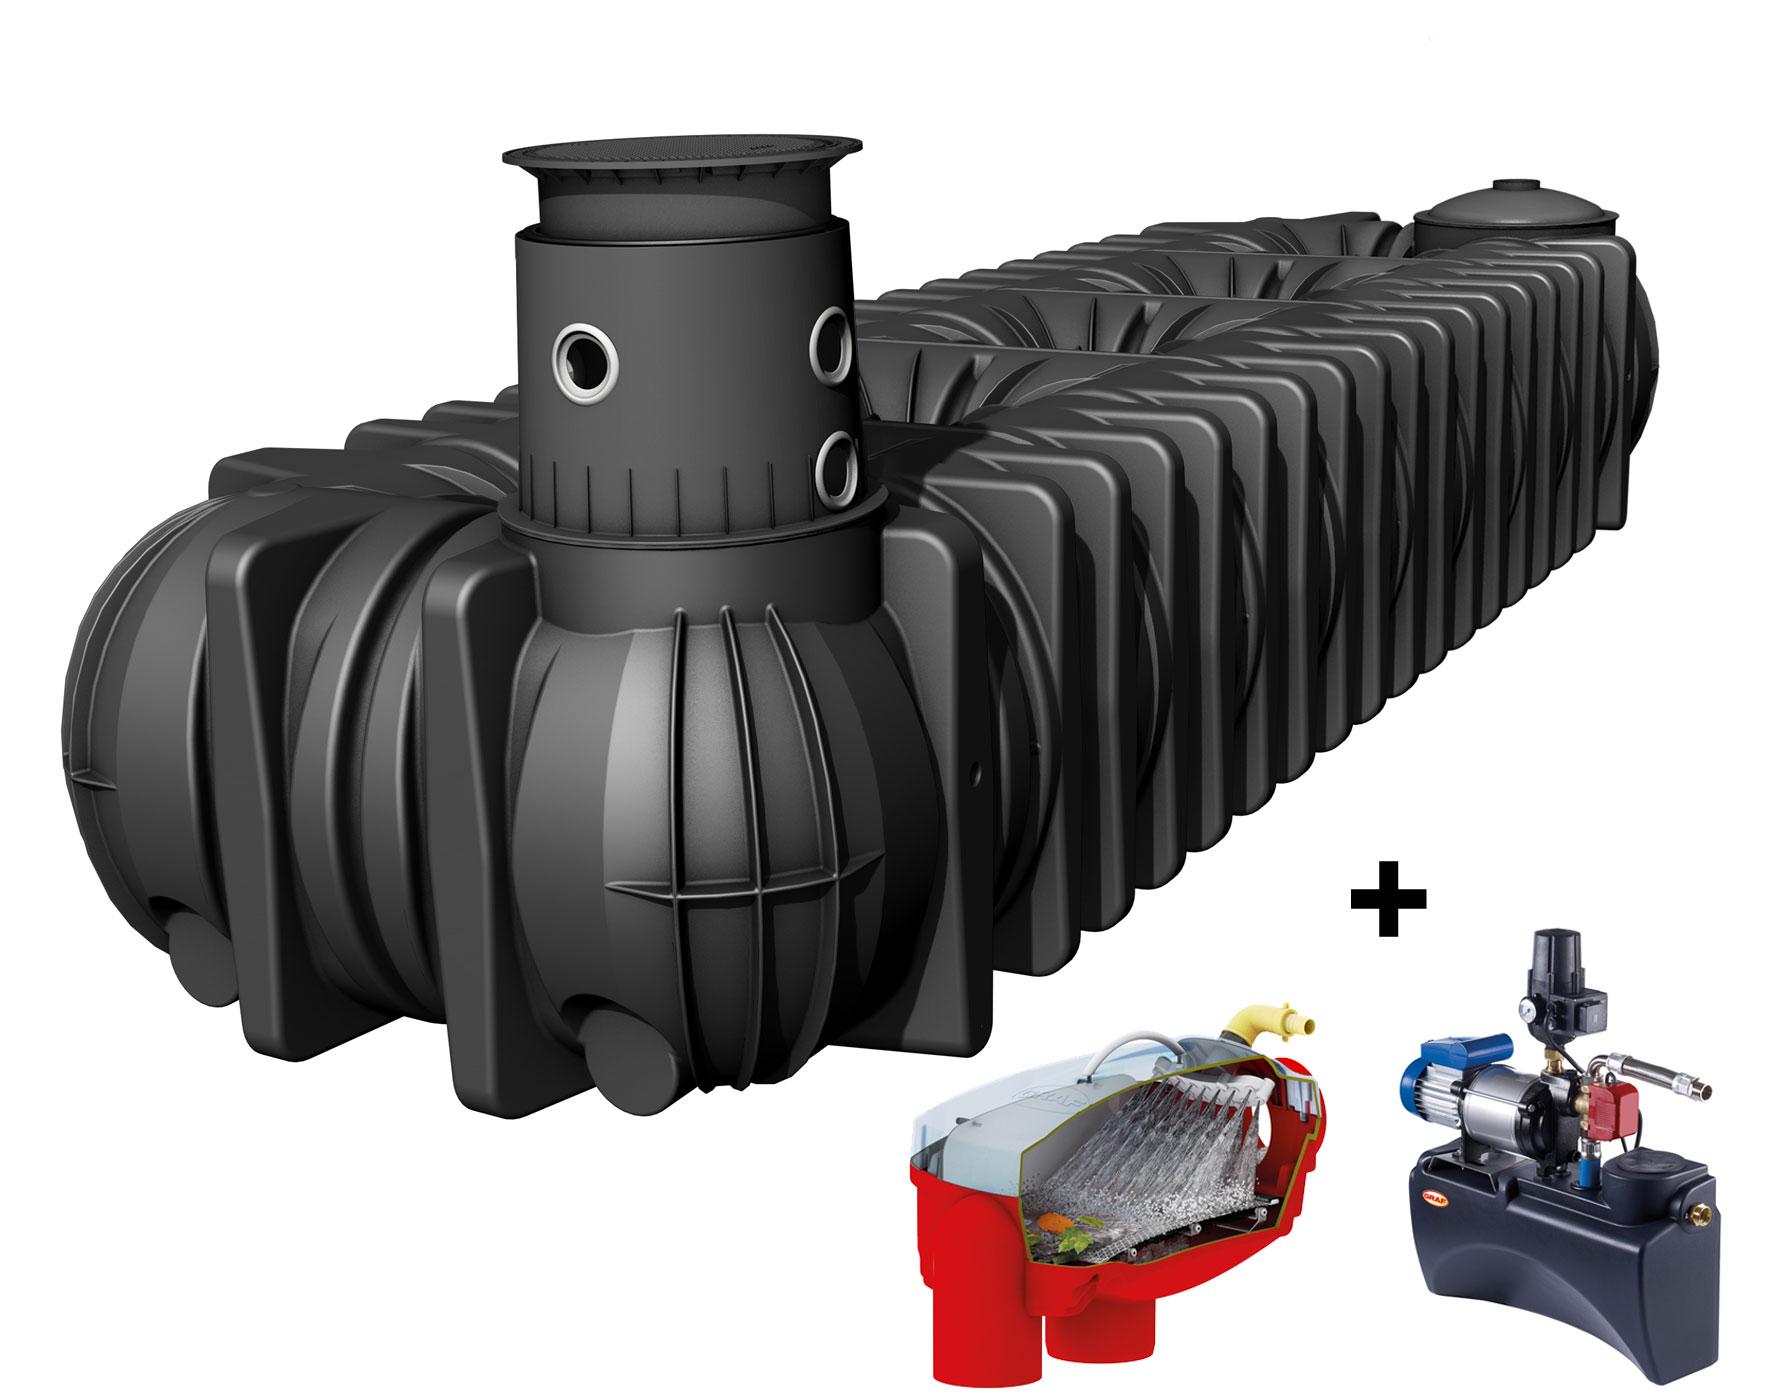 Flachtank Platin XL Set Haus Eco-Plus befahrbar 15000L Graf 390435 Bild 1